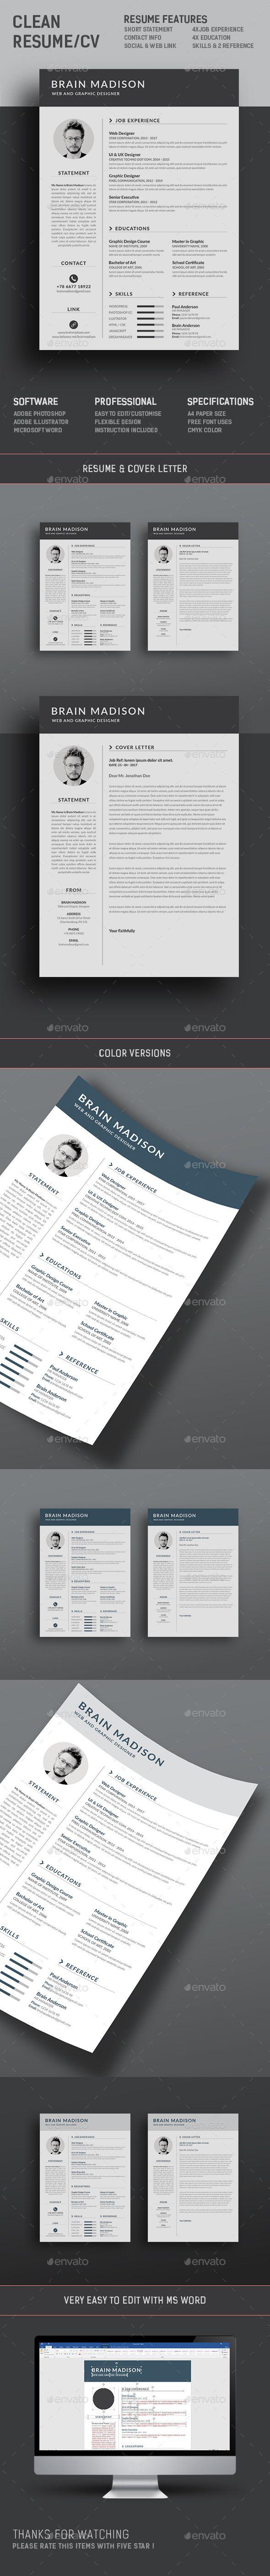 resume simple resume templateresume - Simple Resume Template